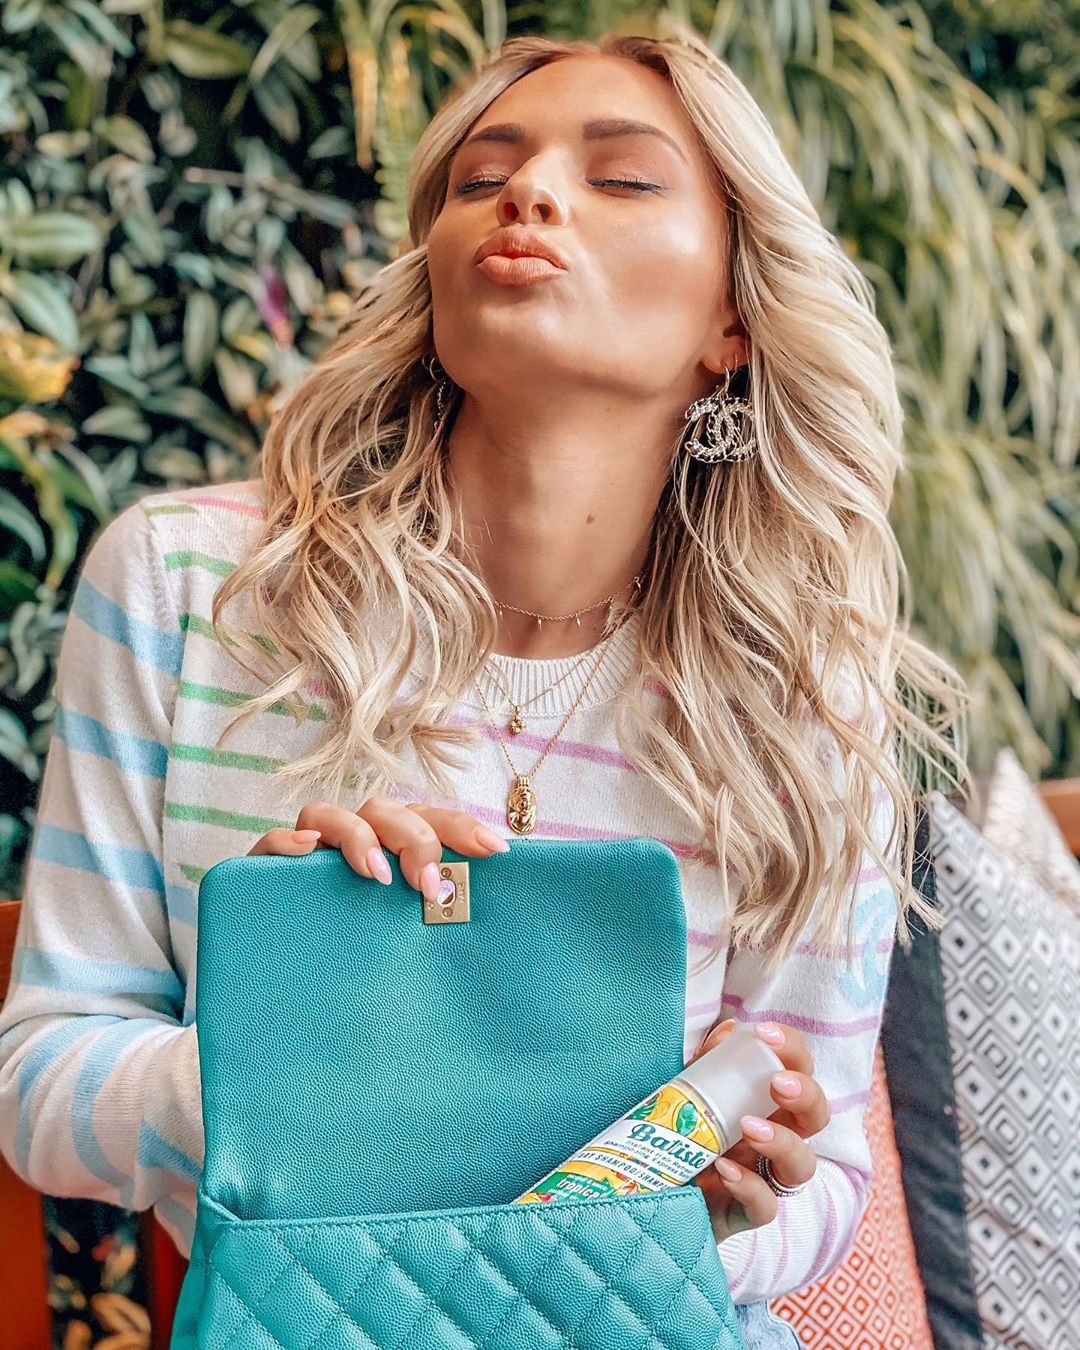 Irina Baeva blond hairs, Outerwear, street fashion